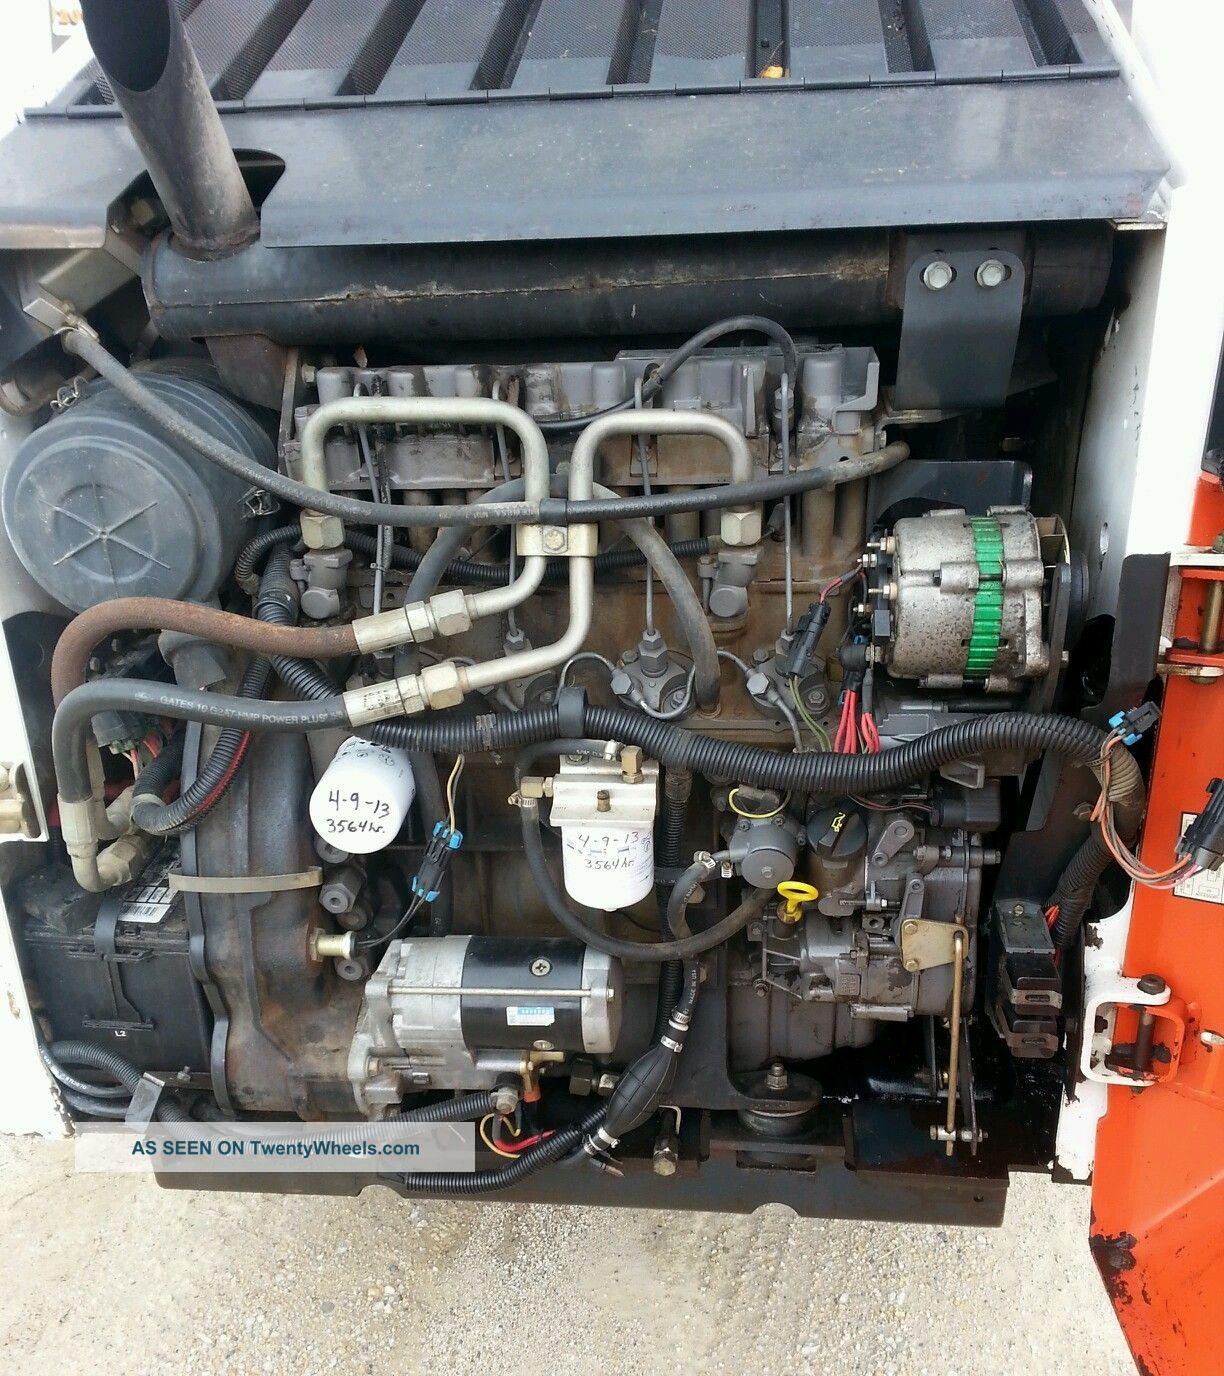 873 bobcat engine - 873 Bobcat Engine 51